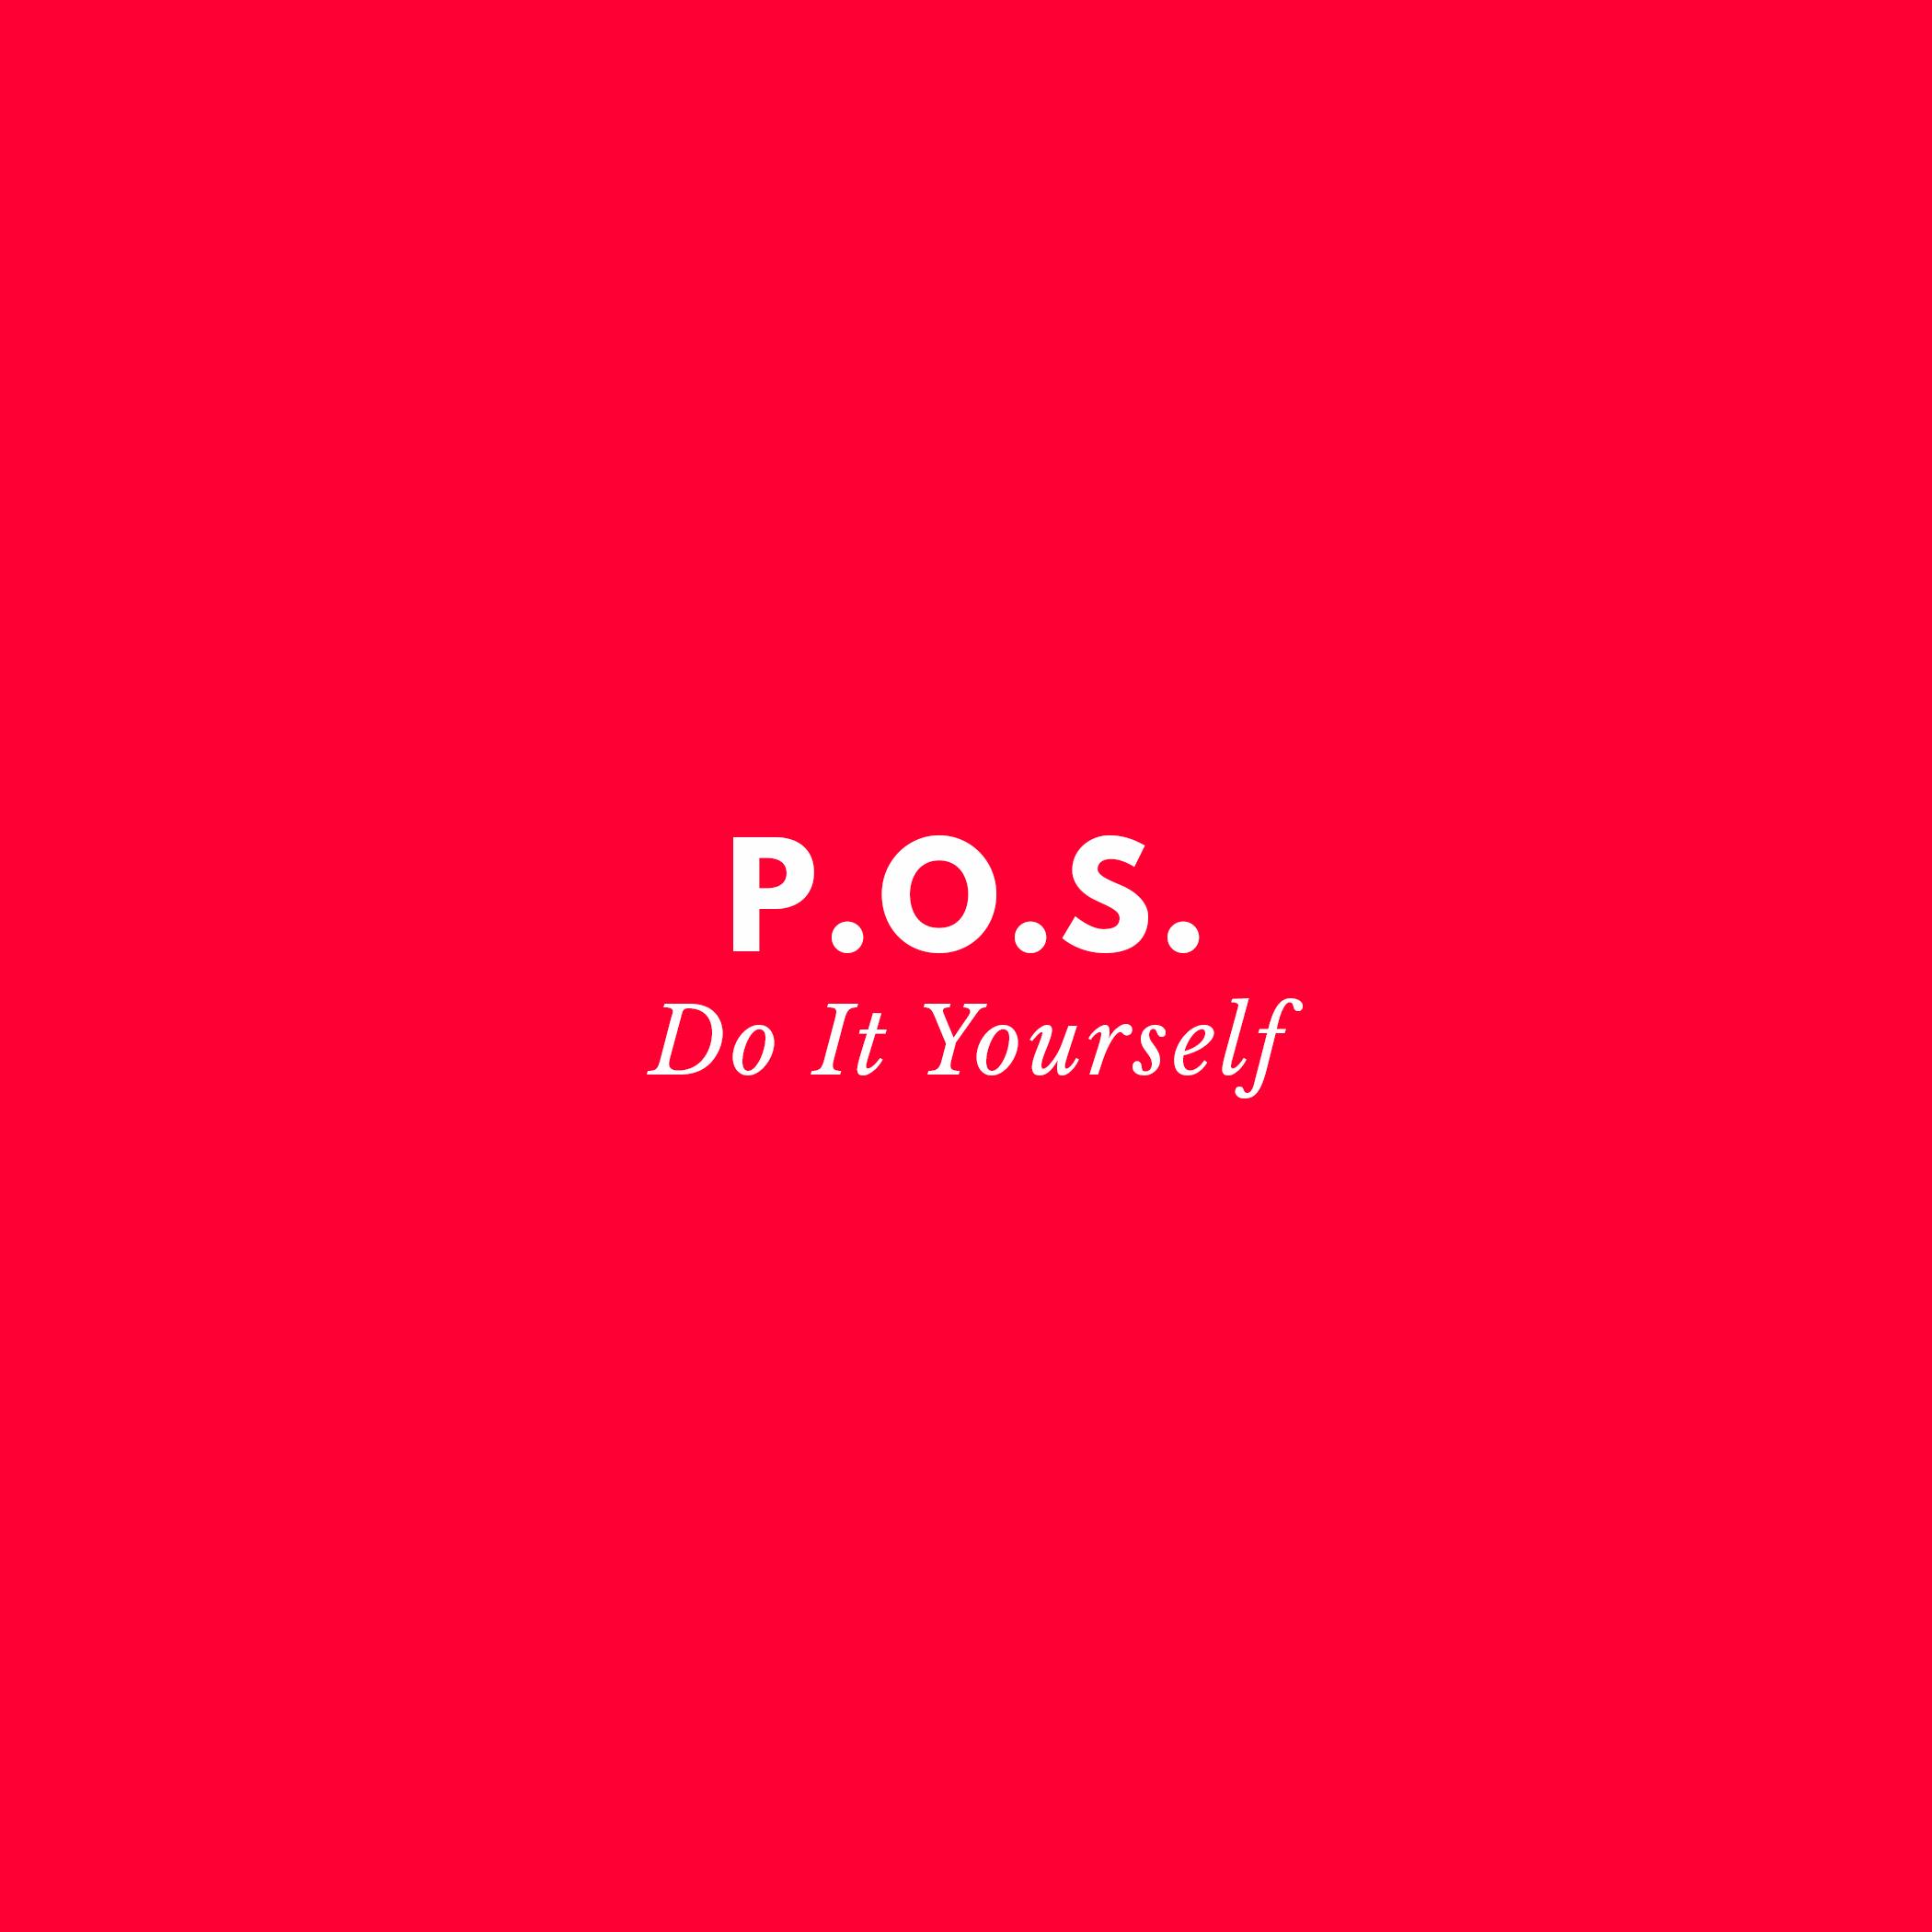 POS-Title.jpg